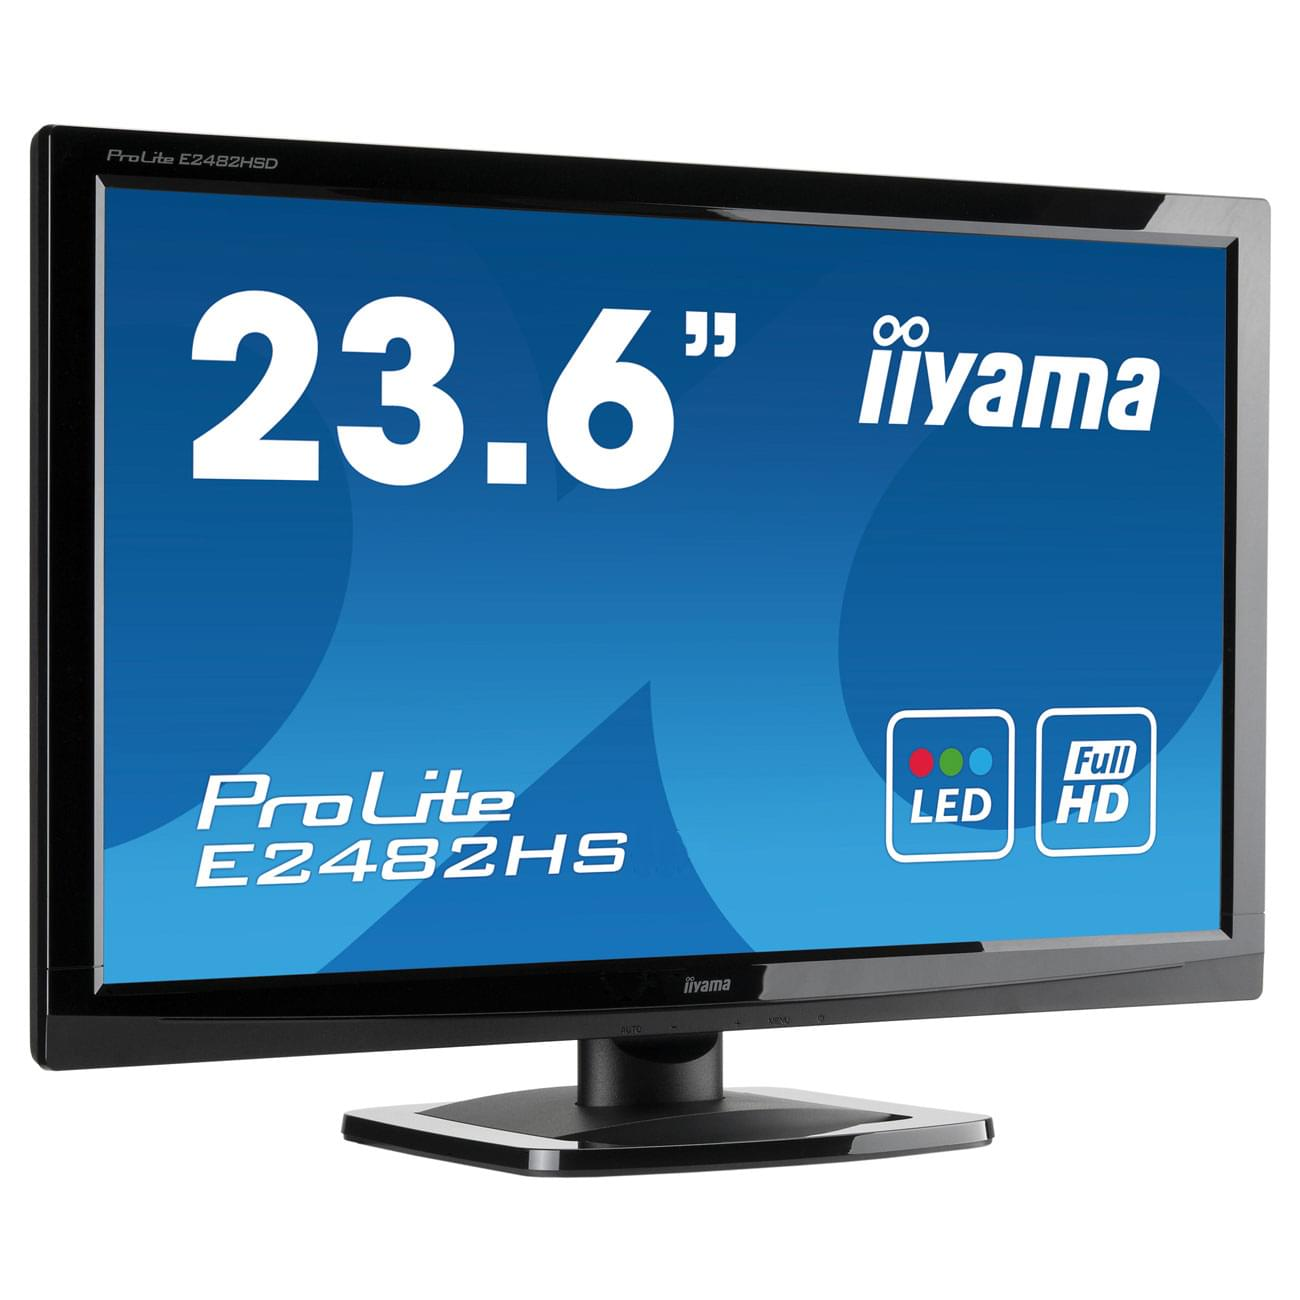 Iiyama E2482HS-GB1 (E2482HS-GB1) - Achat / Vente Ecran PC sur Cybertek.fr - 0